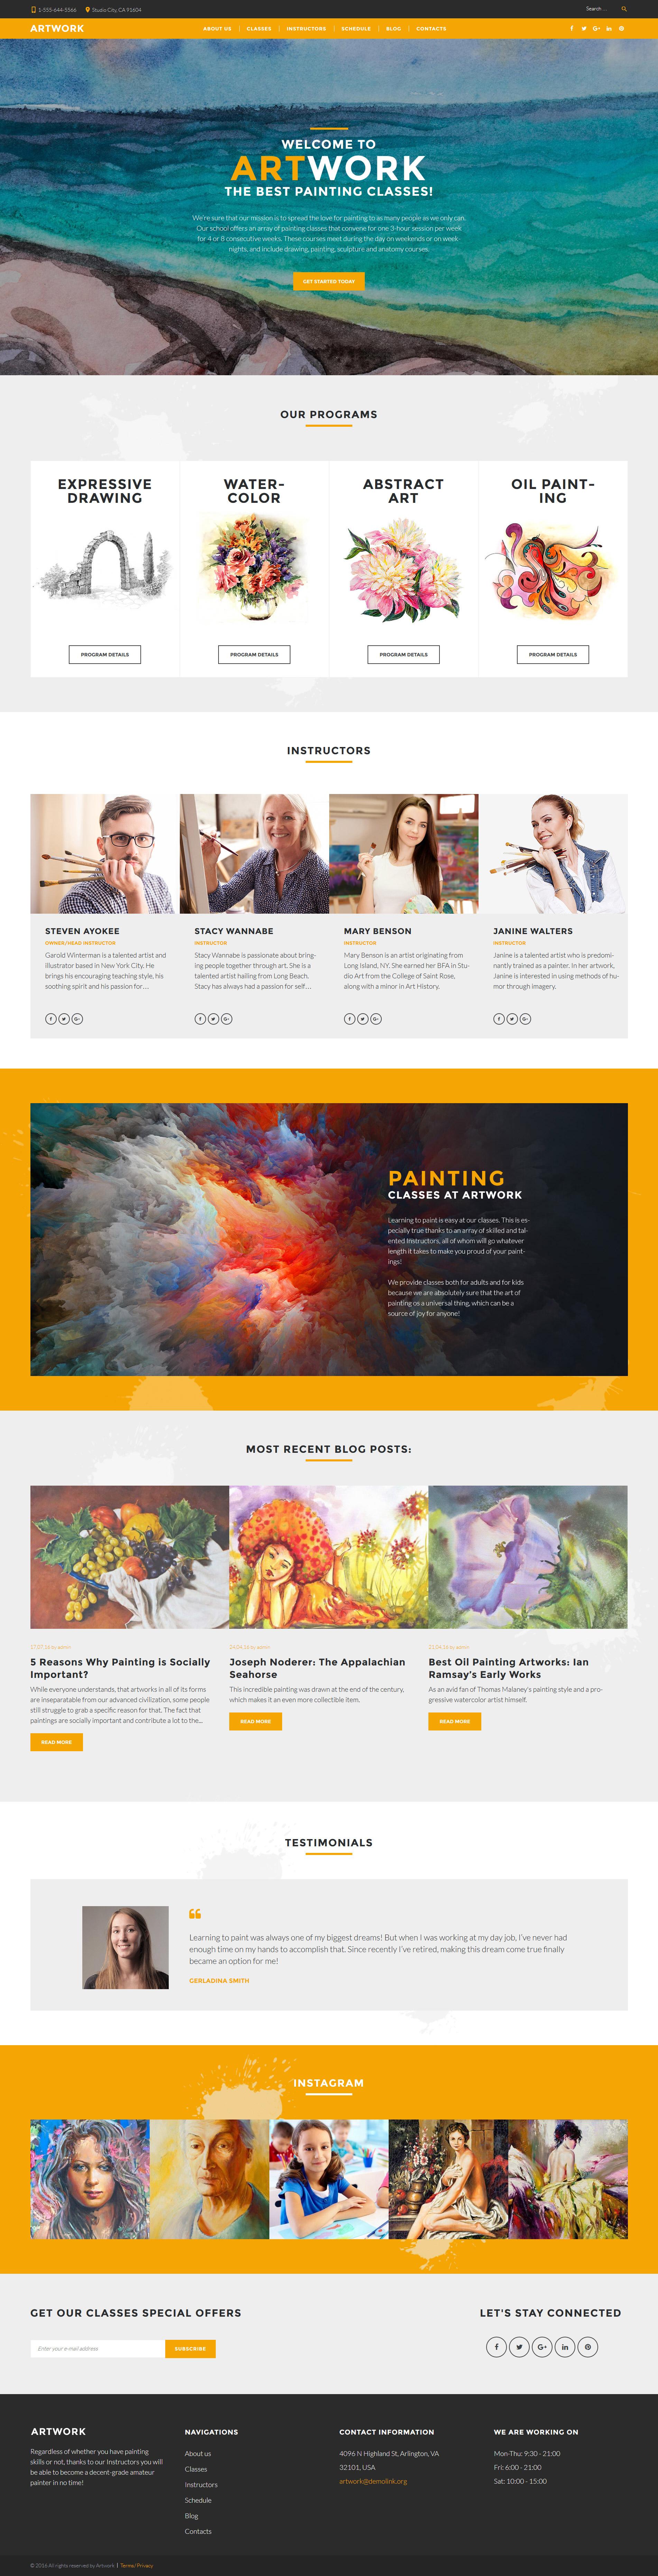 Art School Responsive WordPress Theme - screenshot